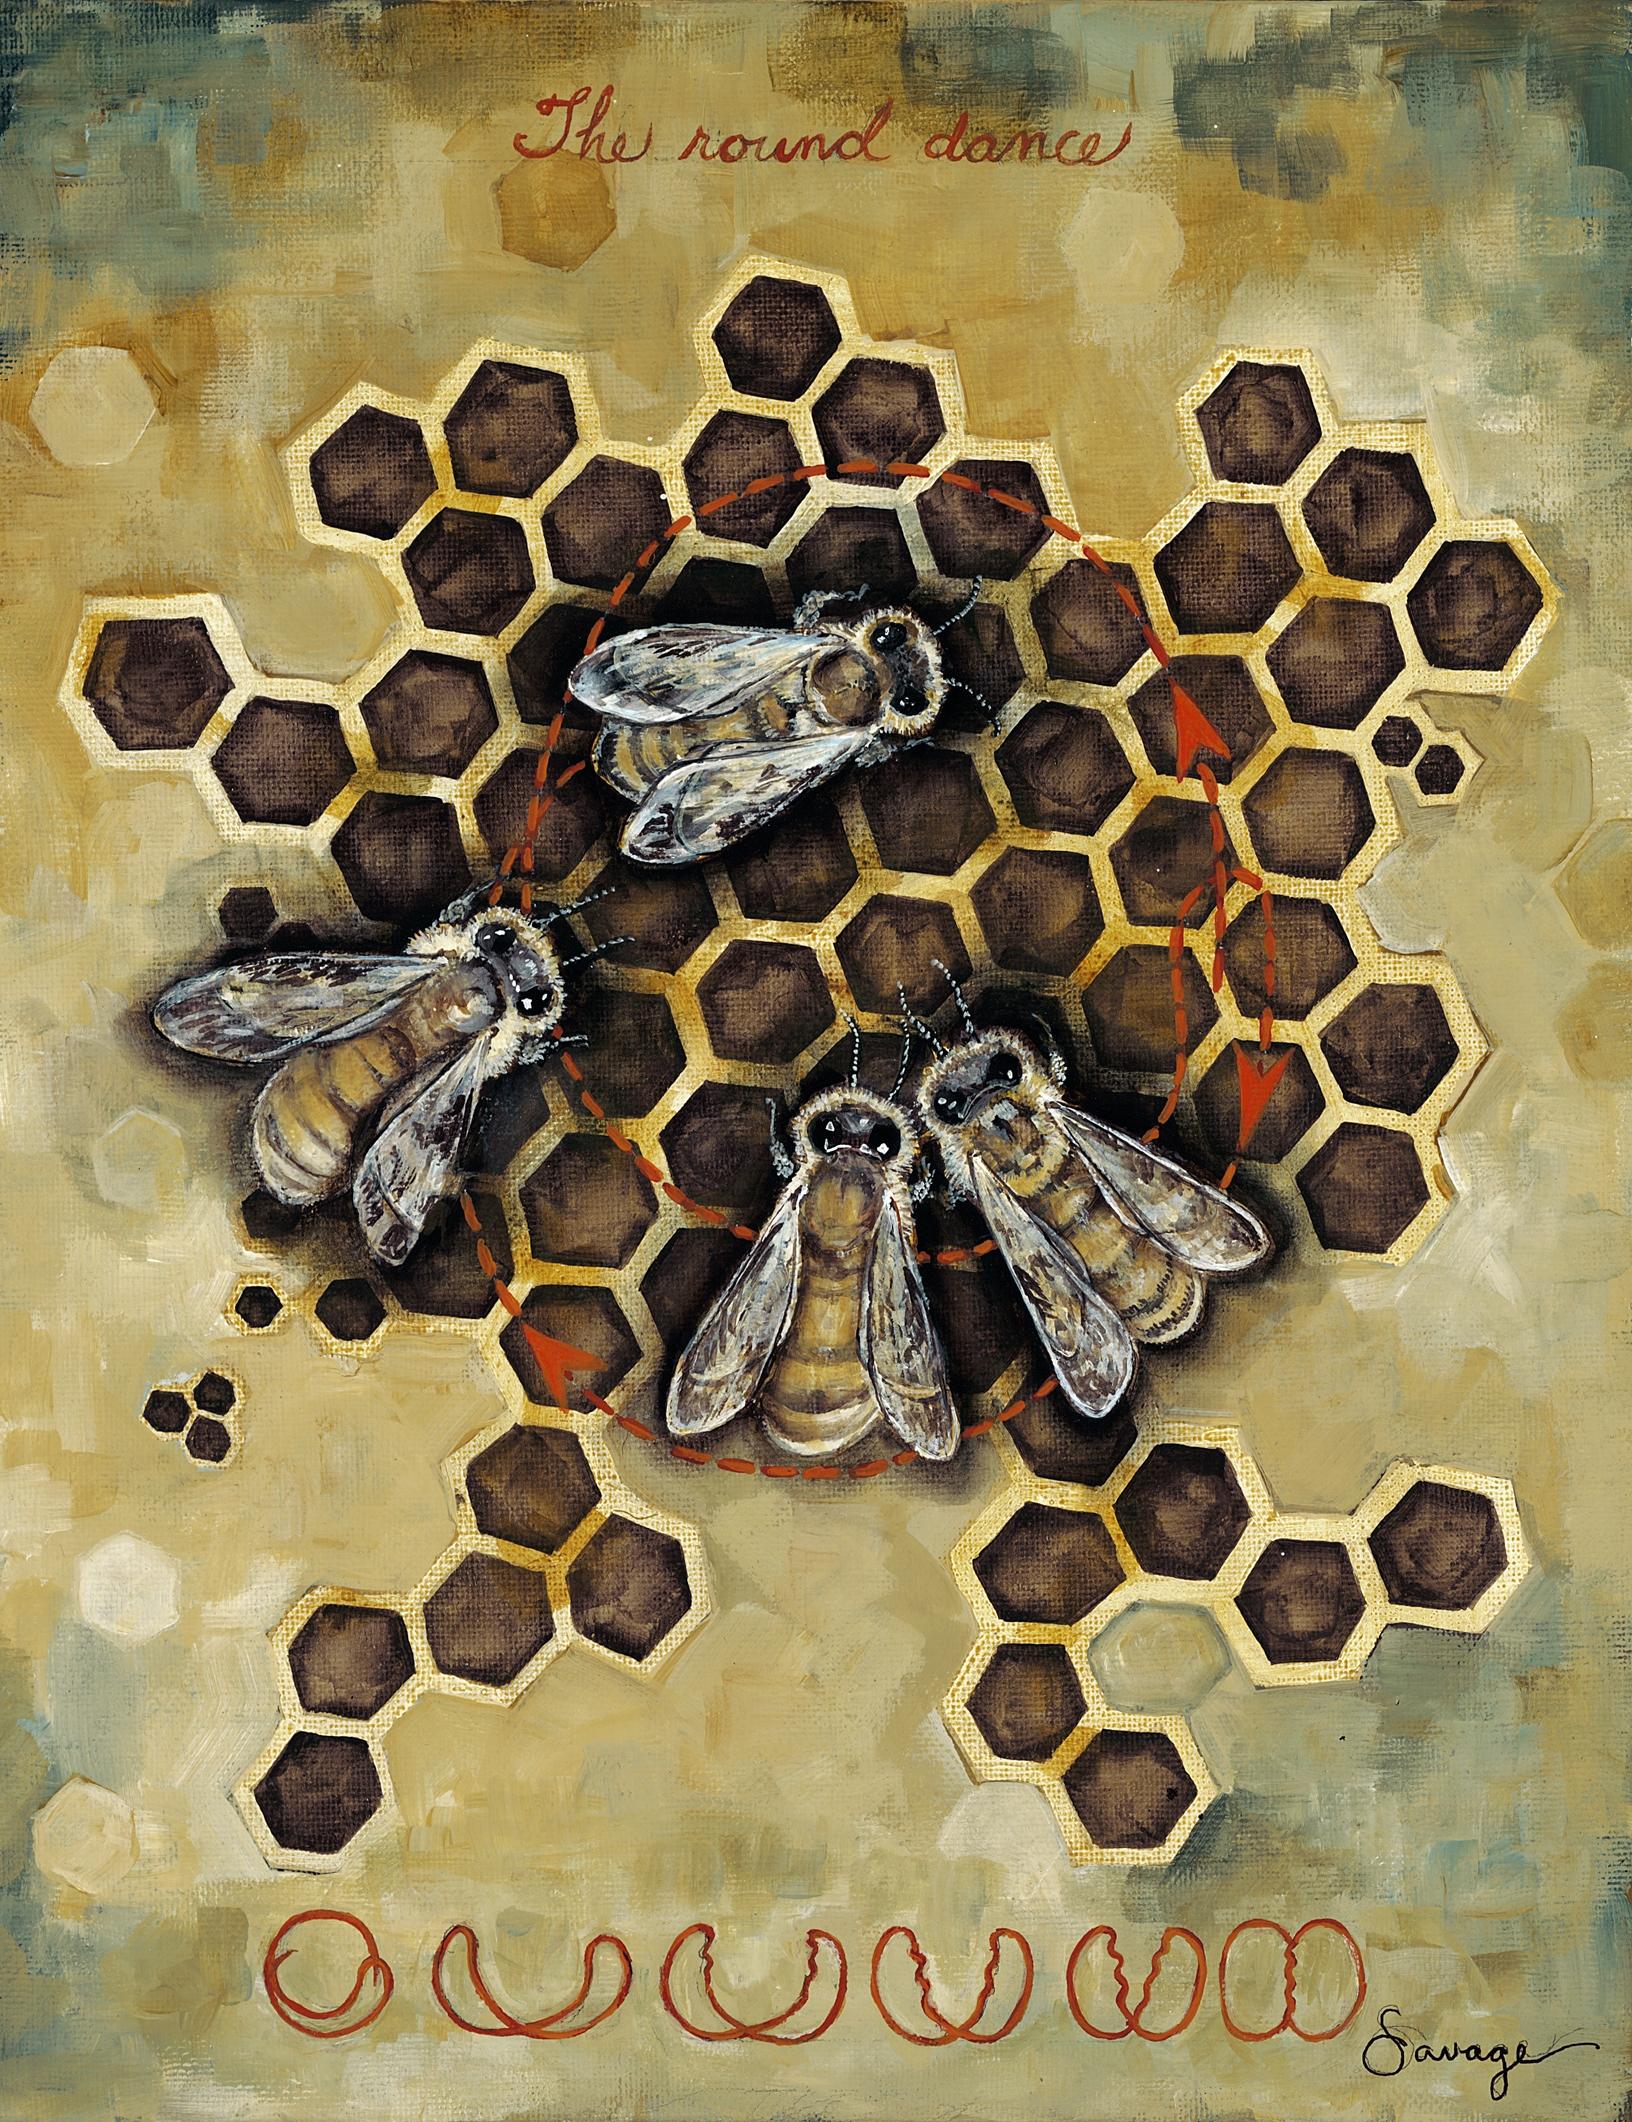 Bee Round Dance